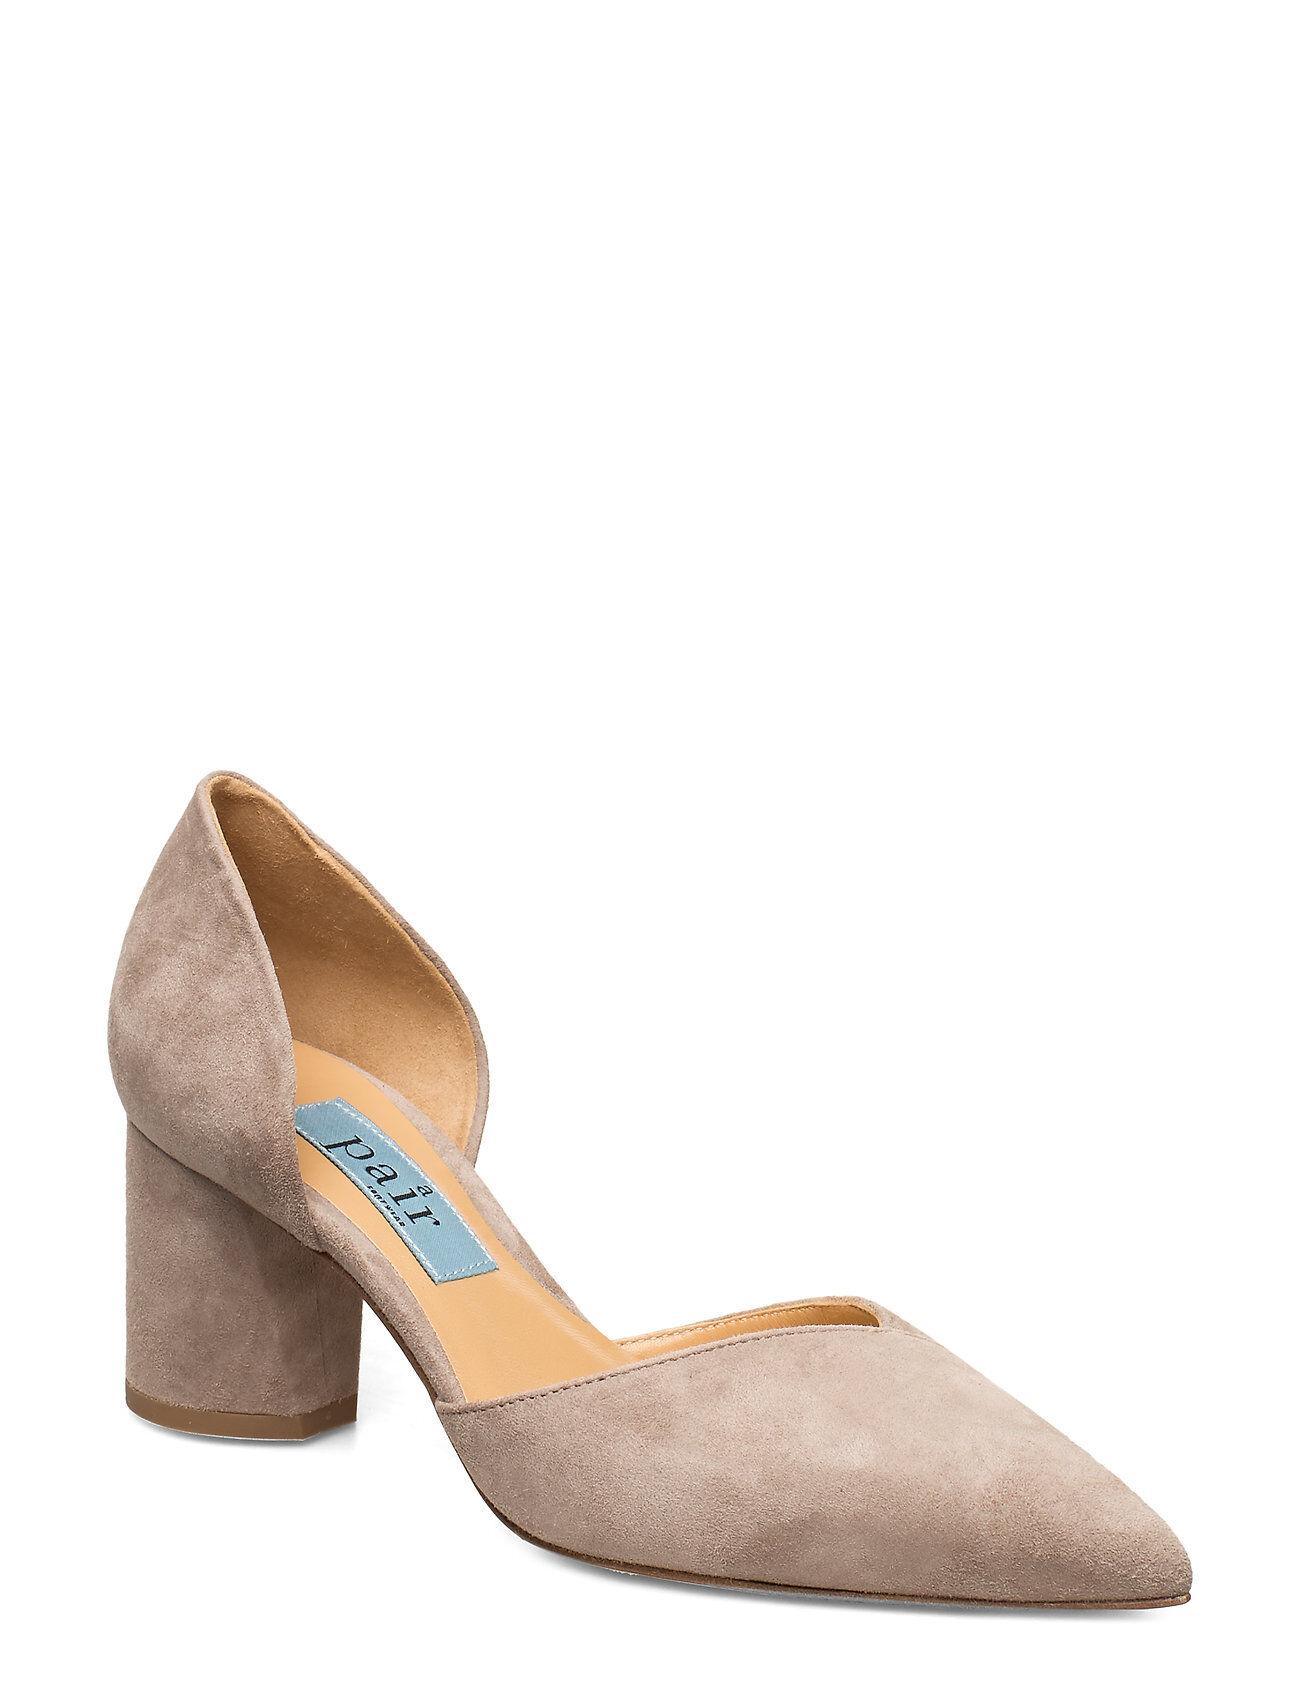 Apair Open Side Low Chunky Shoes Heels Pumps Classic Harmaa Apair